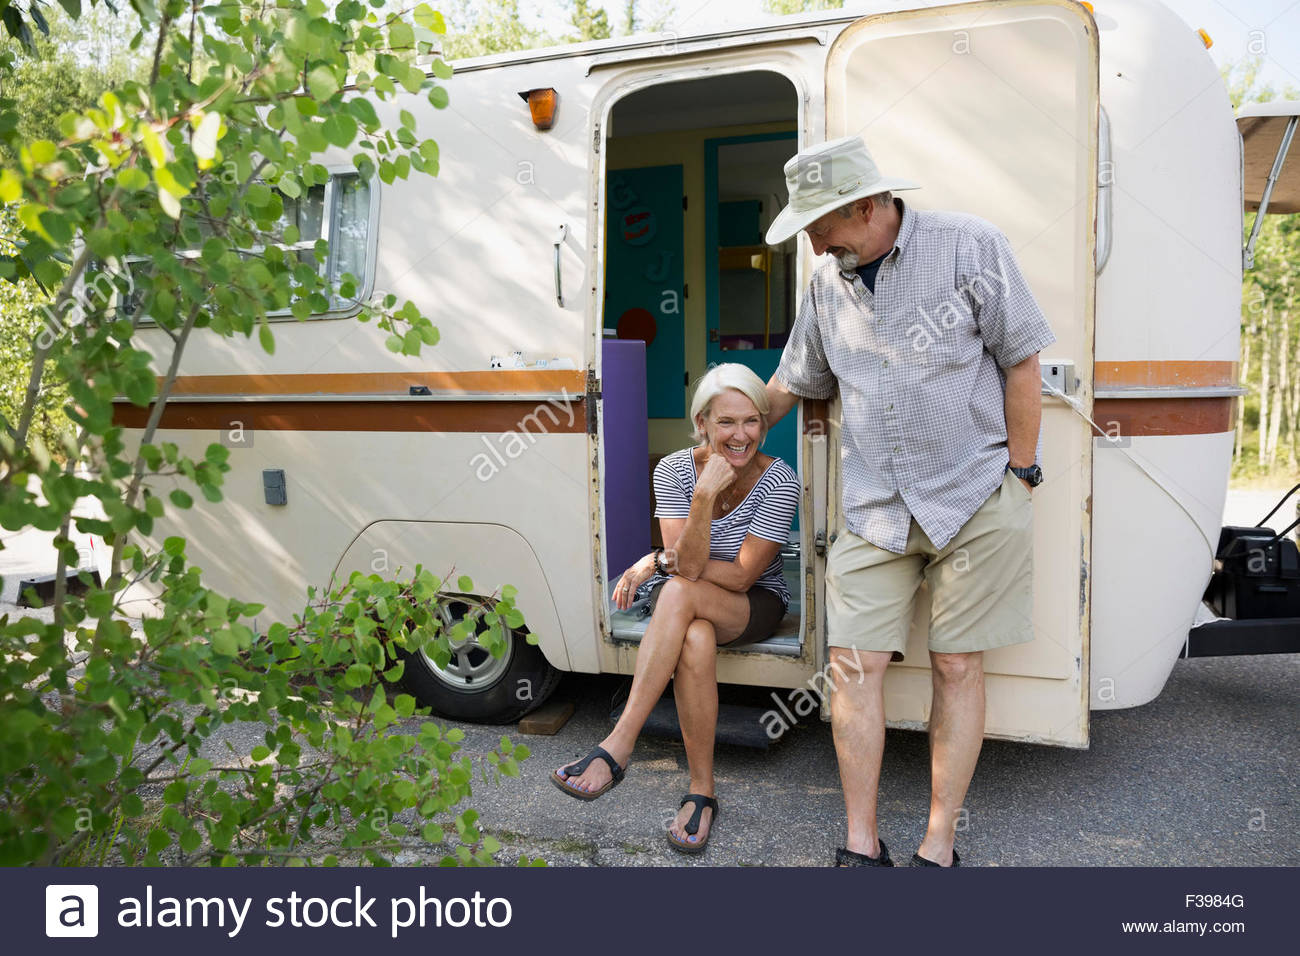 Senior couple at doorway of camper trailer - Stock Image